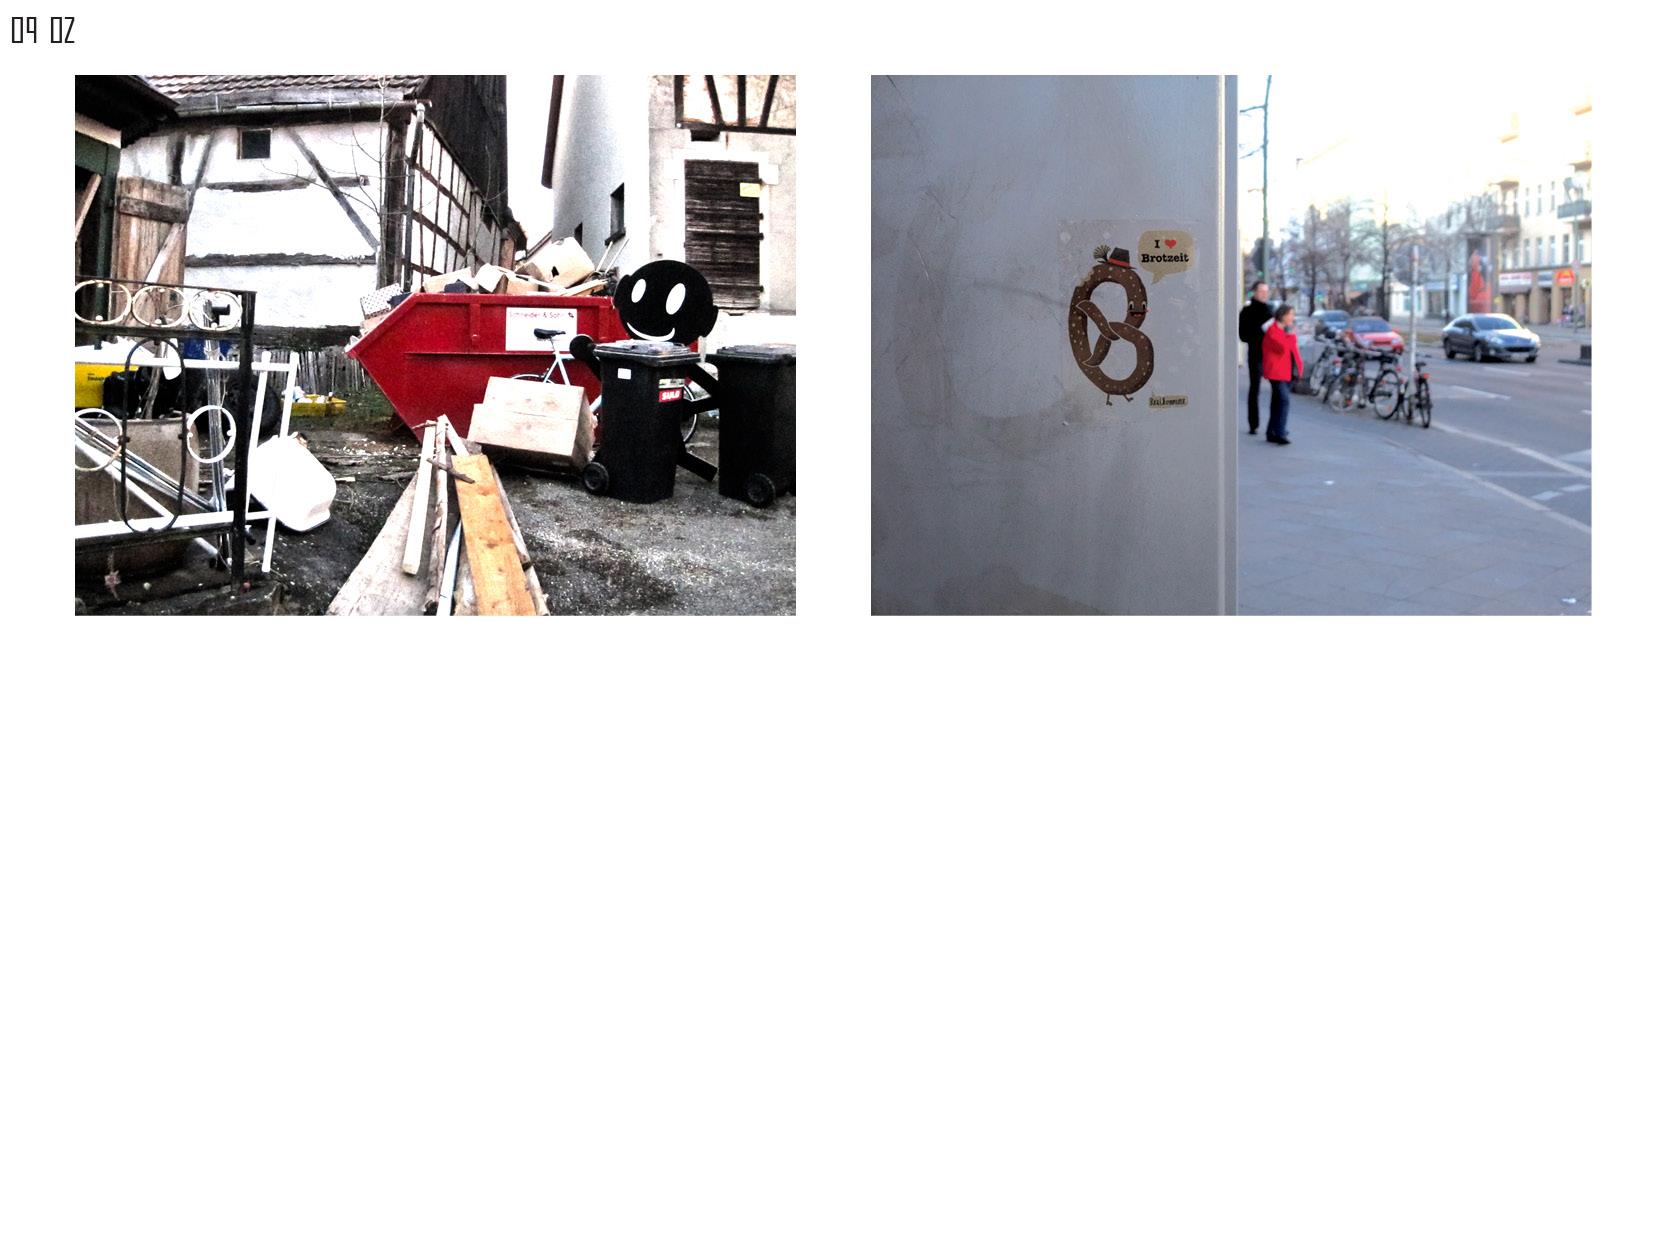 Gerrit-Schweiger-Dialog-Städte-Paris-Berlin-Jessica-Blank-Experiment-Fotoserie-Tagebuch-visuelle-Kommunikation-100